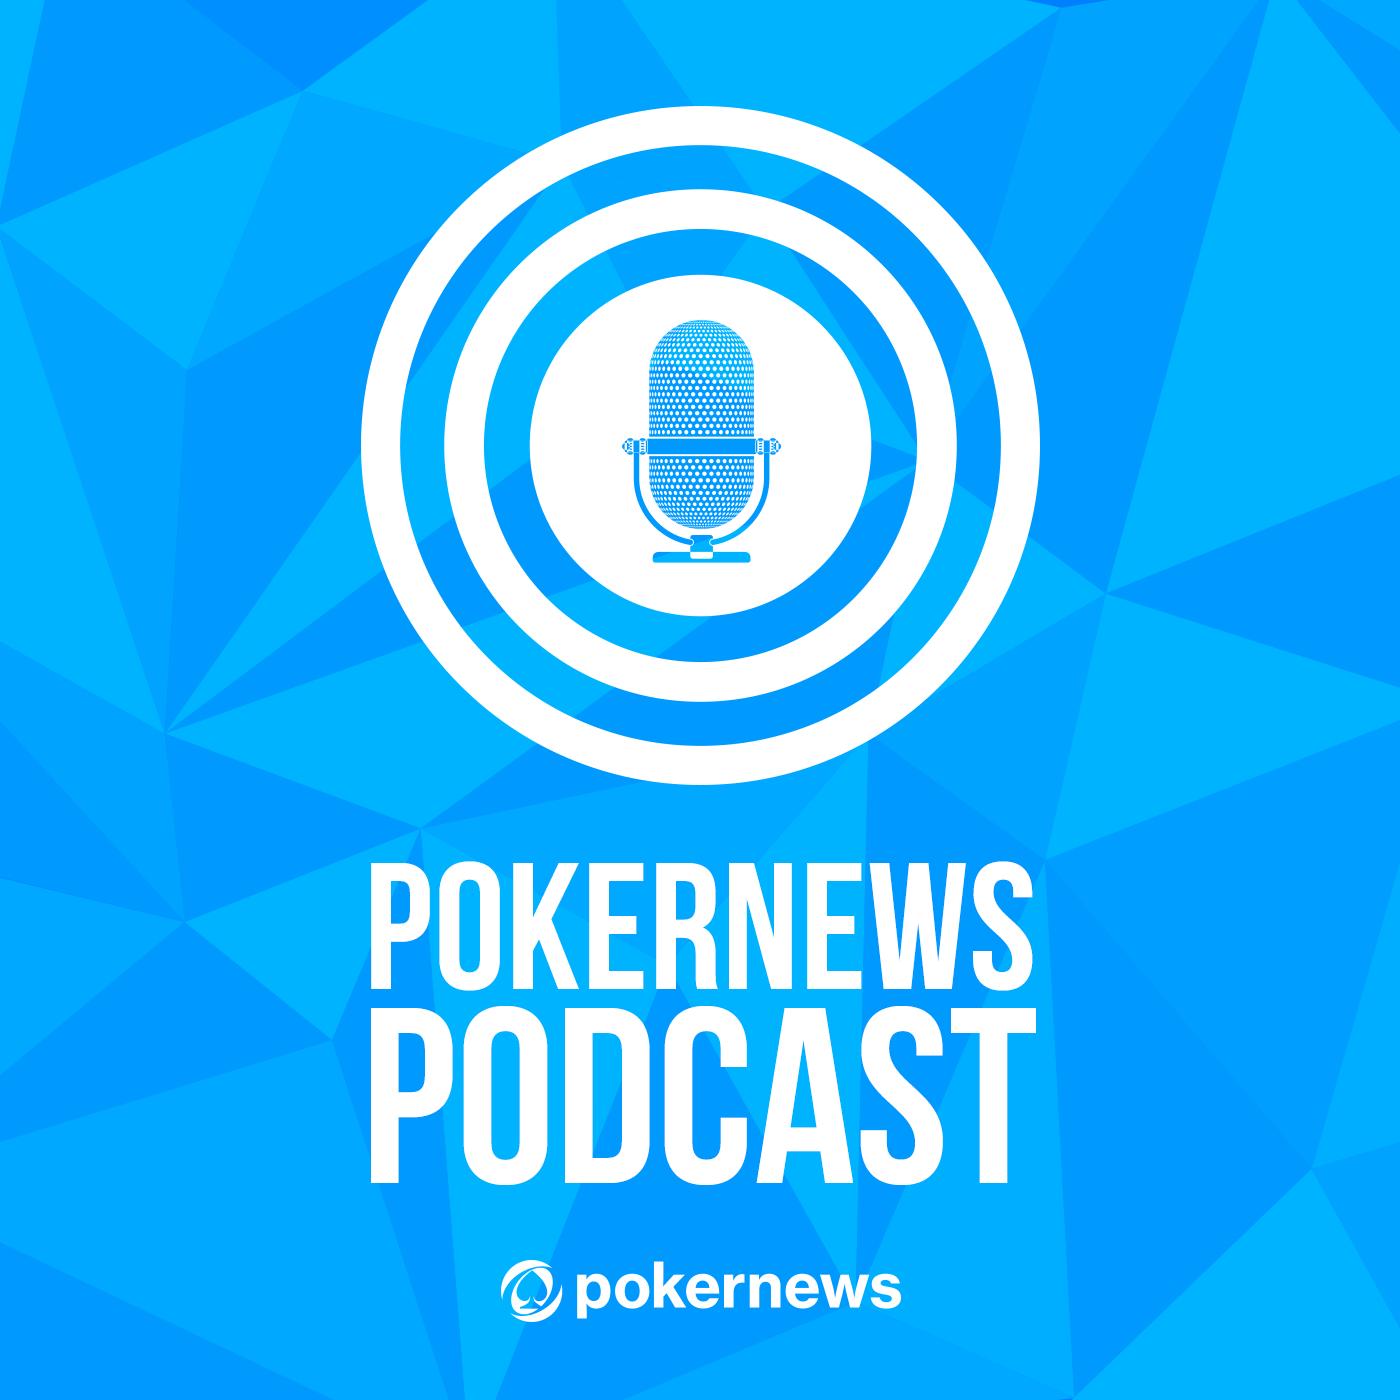 PokerNews Podcast show art